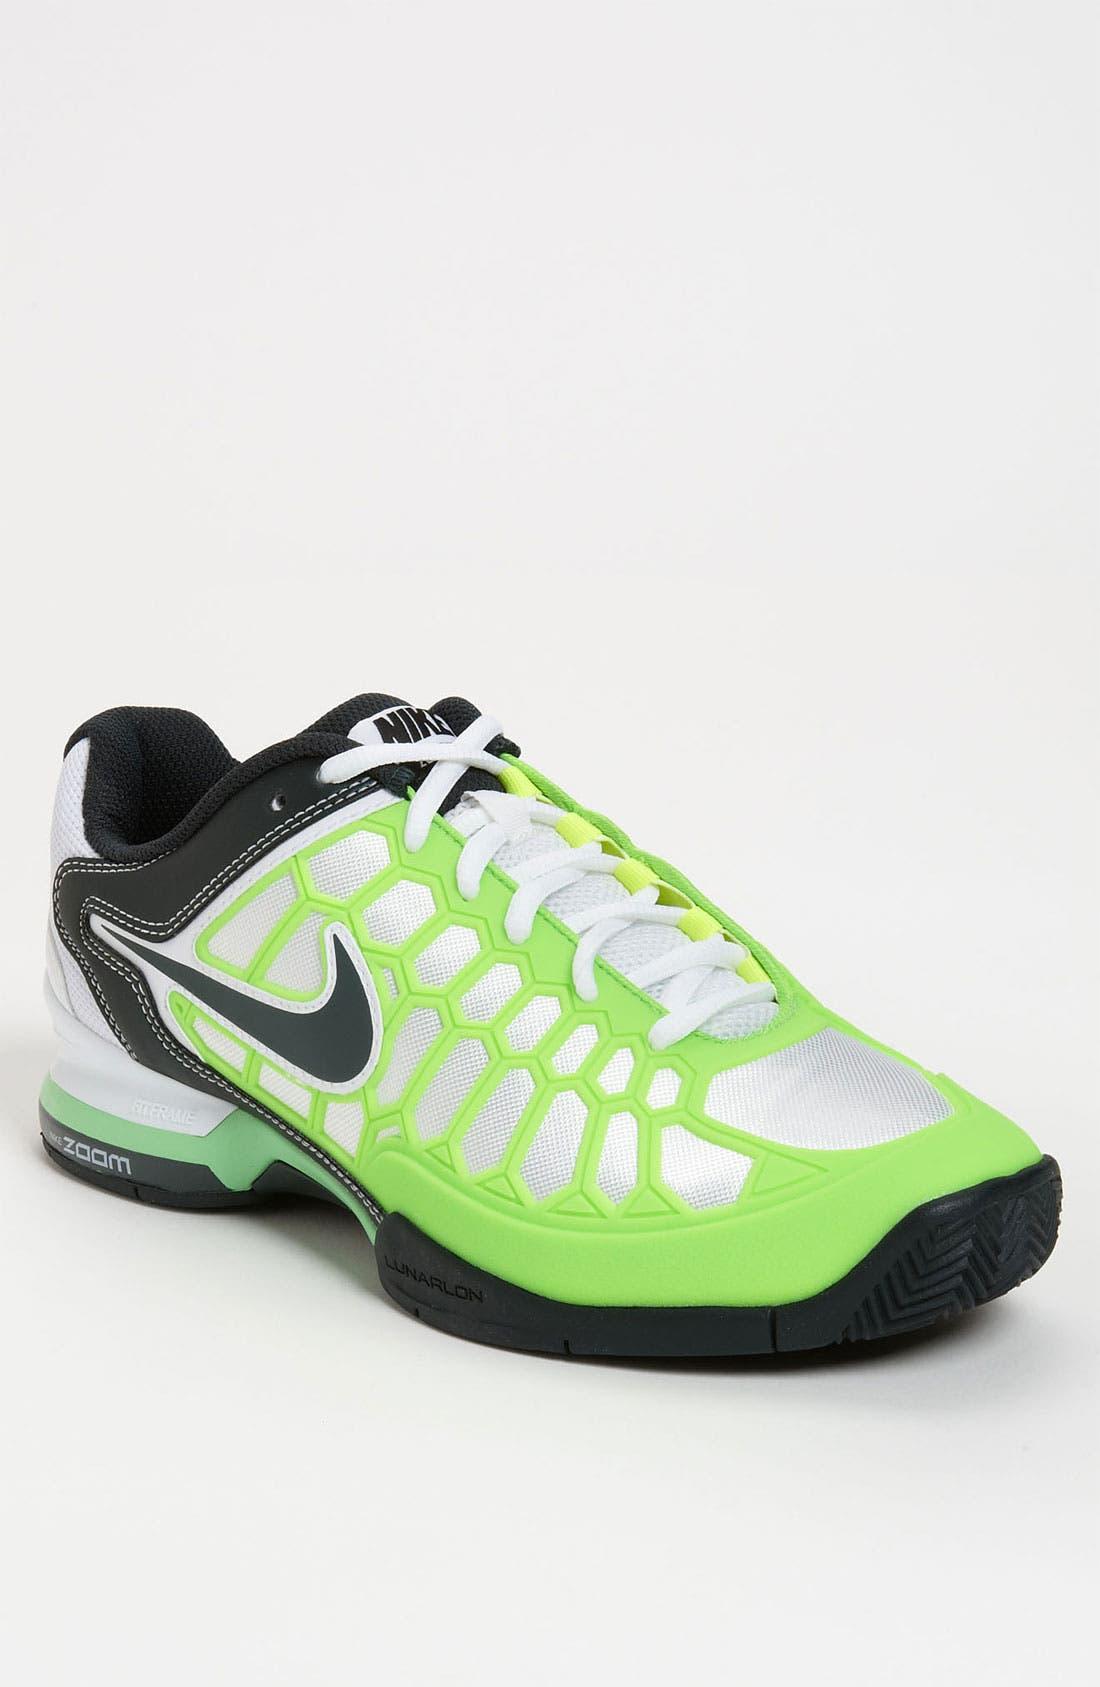 Main Image - Nike 'Zoom Breathe 2K12' Tennis Shoe (Men)